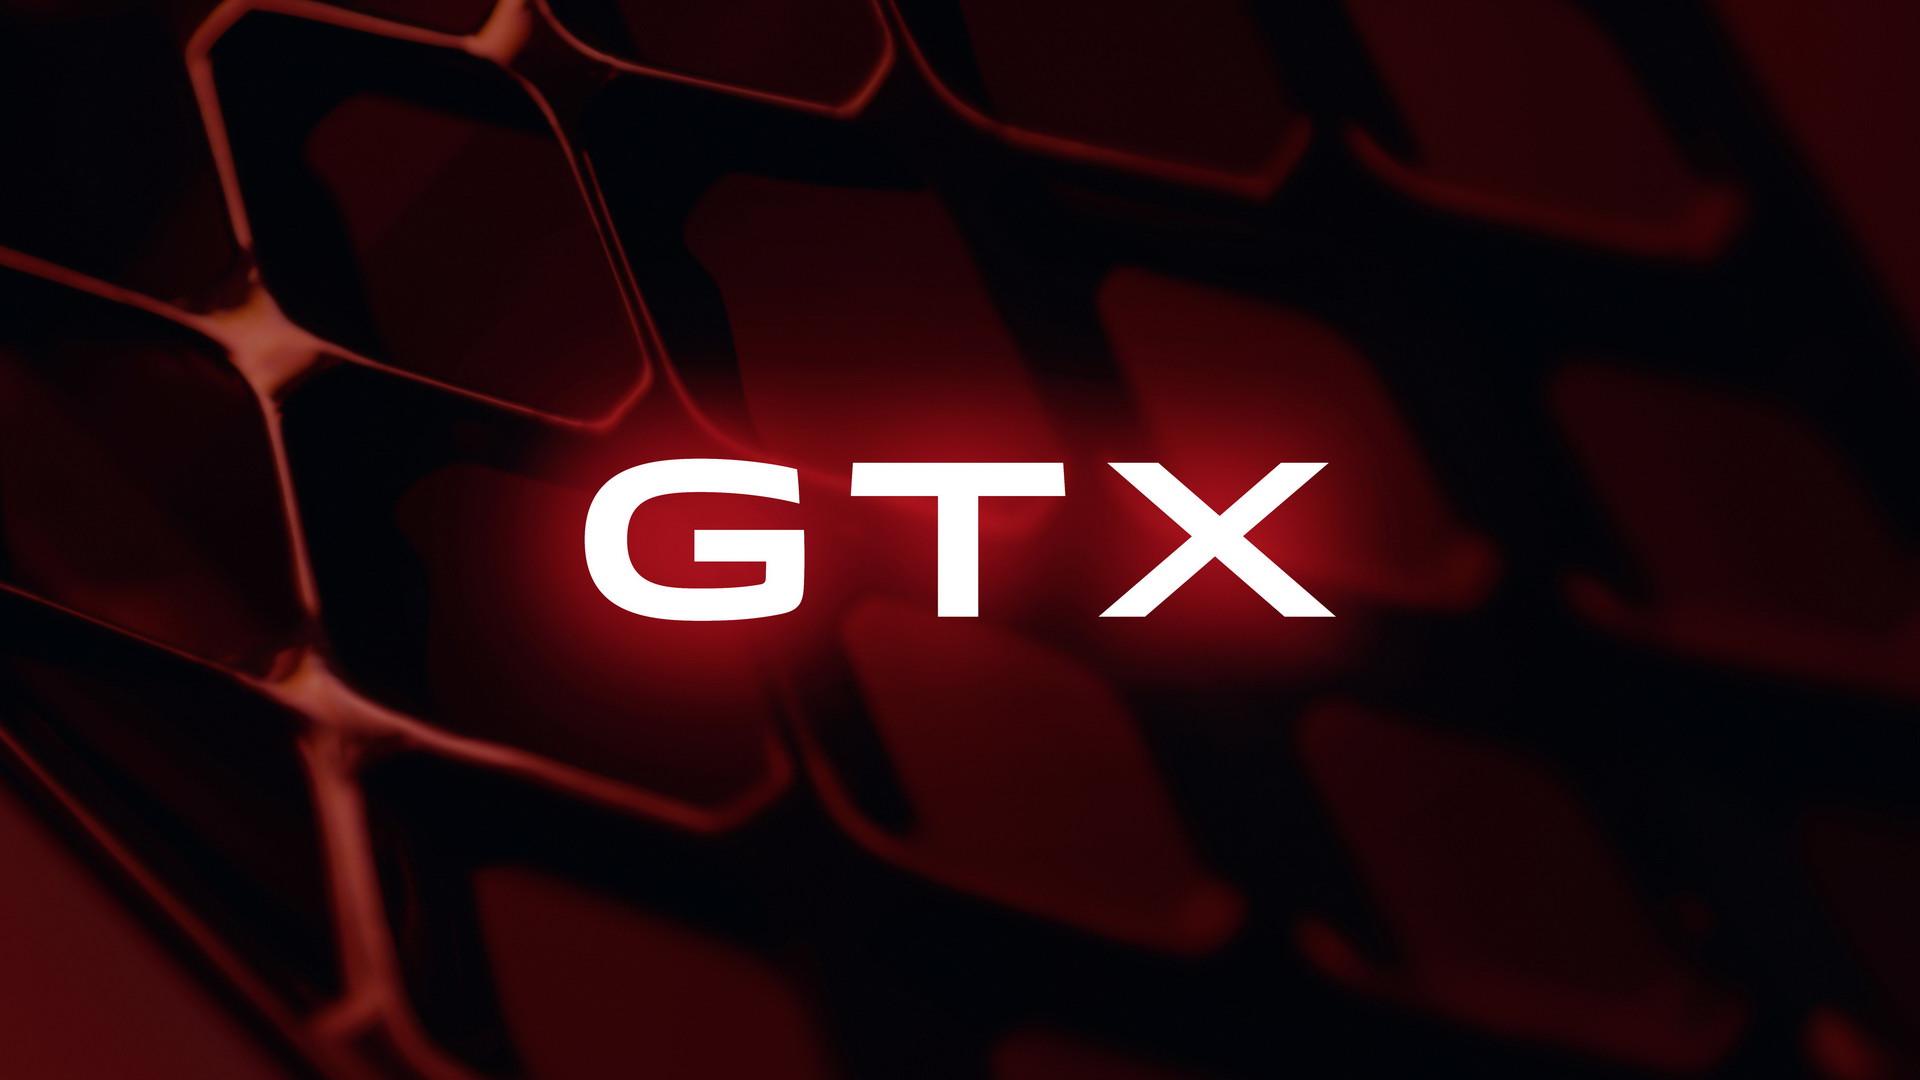 VW GTX